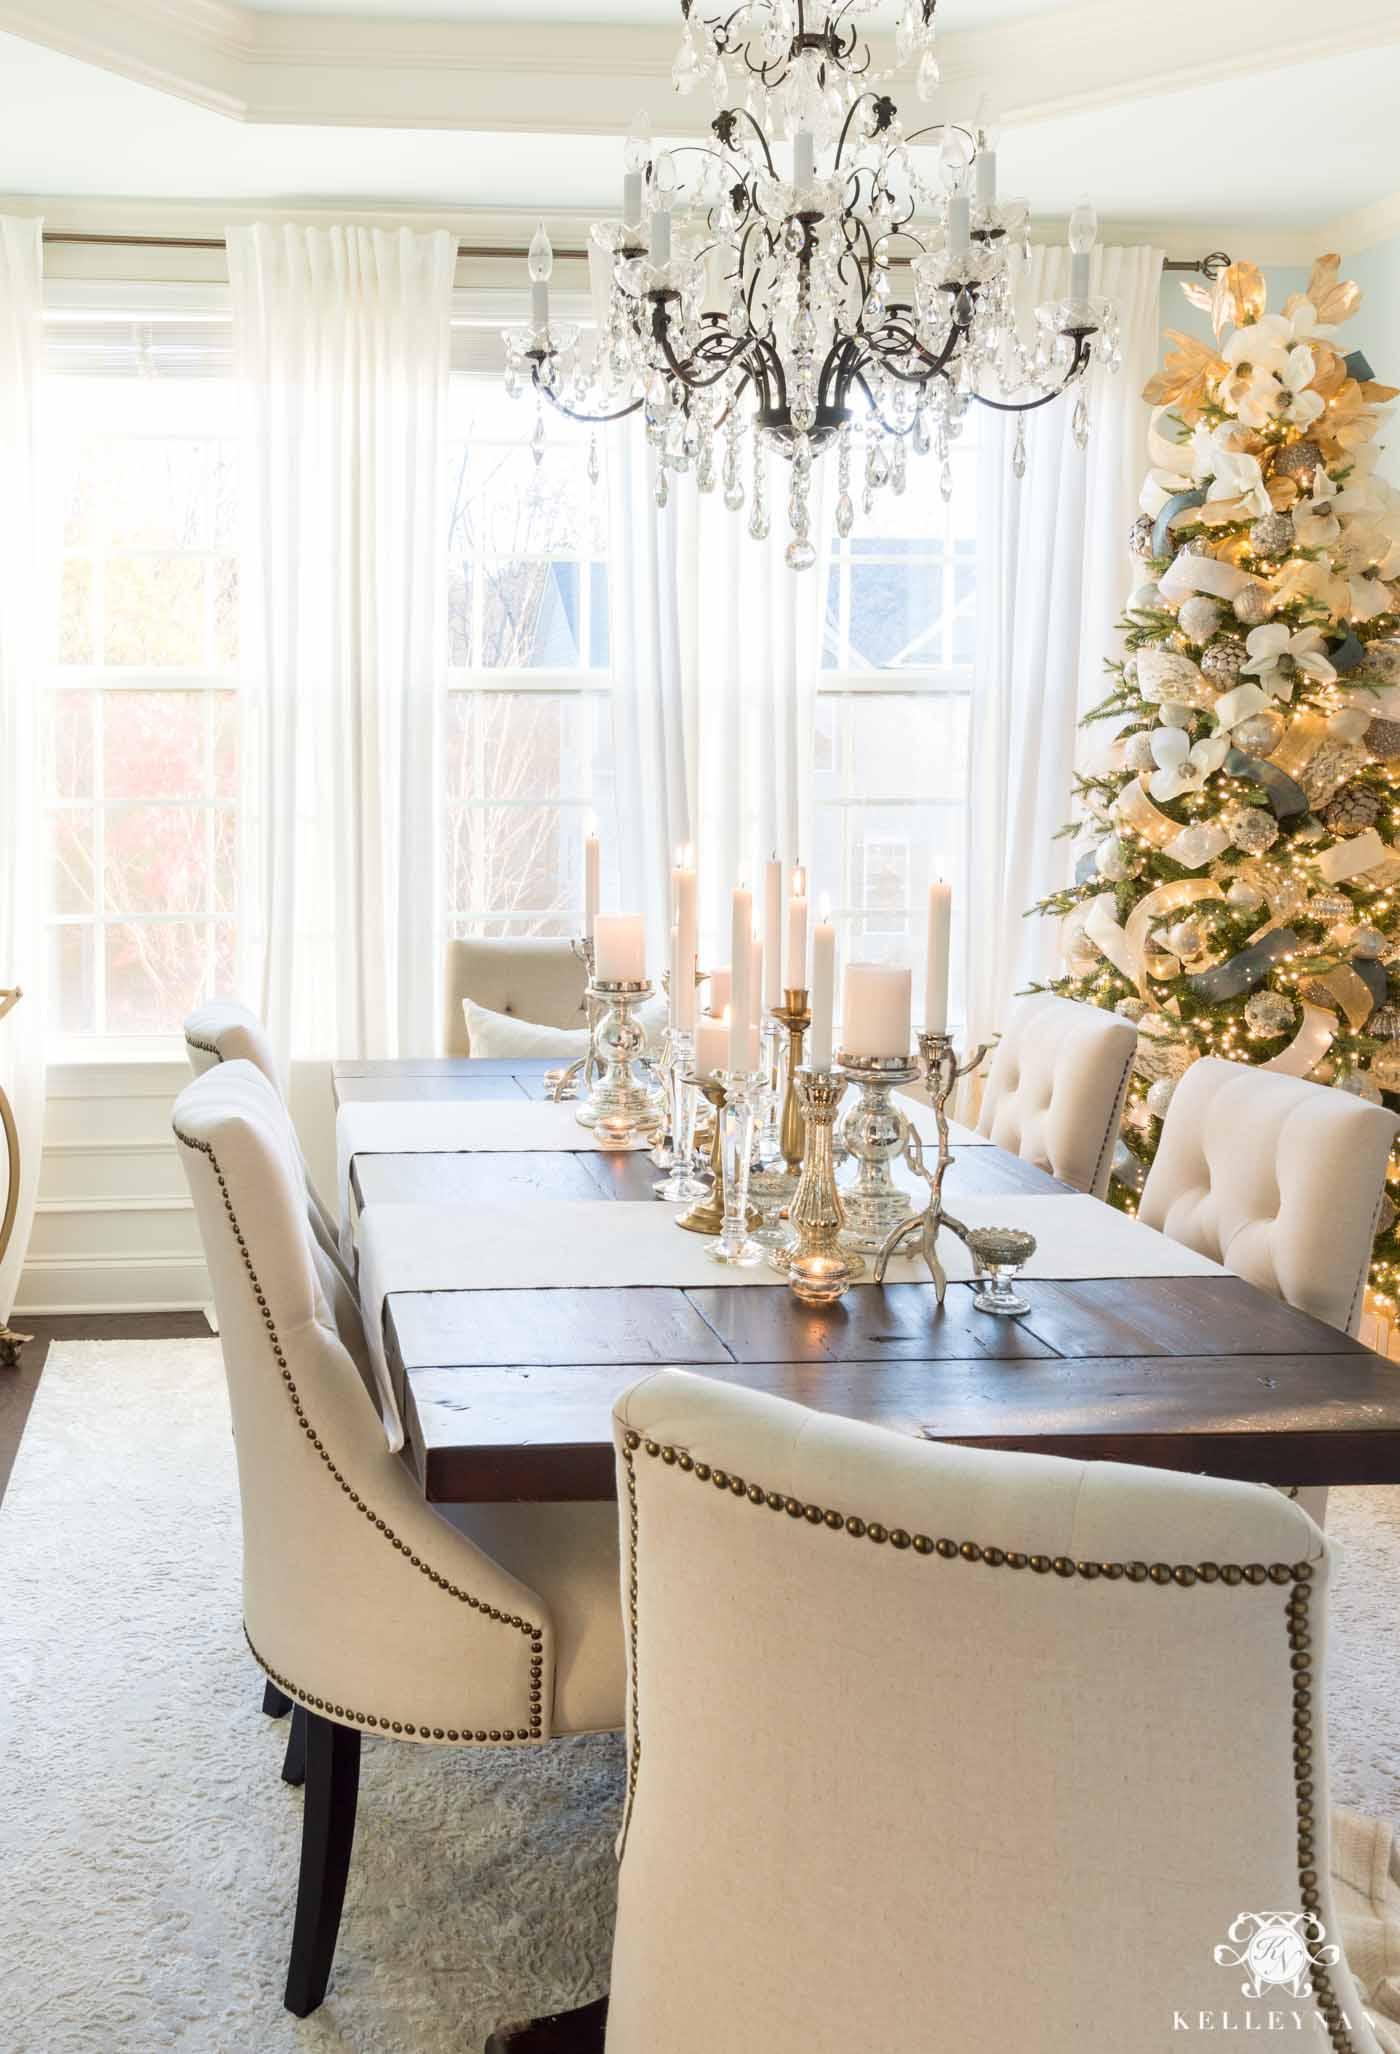 Ikea Ritva Drapes The Best Inexpensive White Curtains